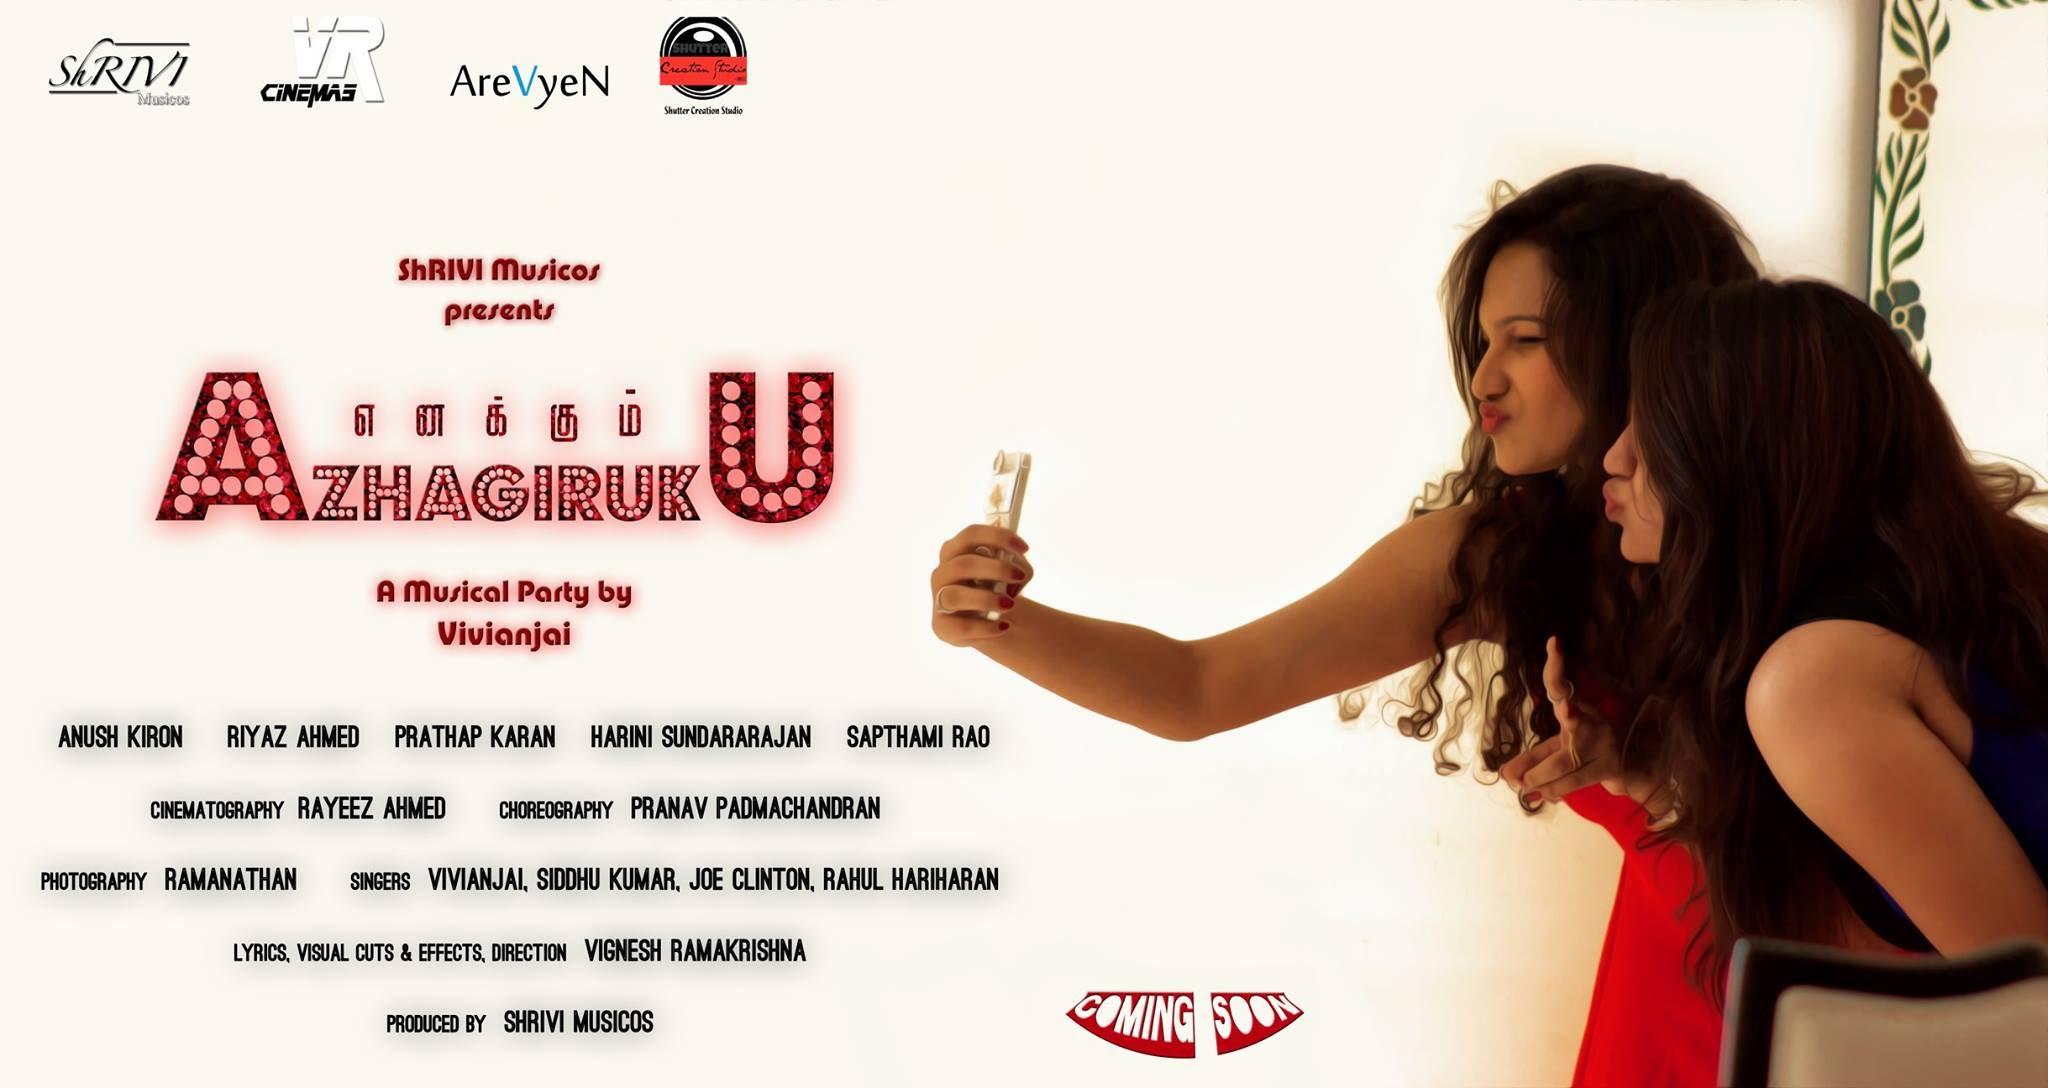 Tamil Album Songs – Enakum Azhagiruku | Vivianjai | Vignesh Ramakrishna | Swag's Party | HD |